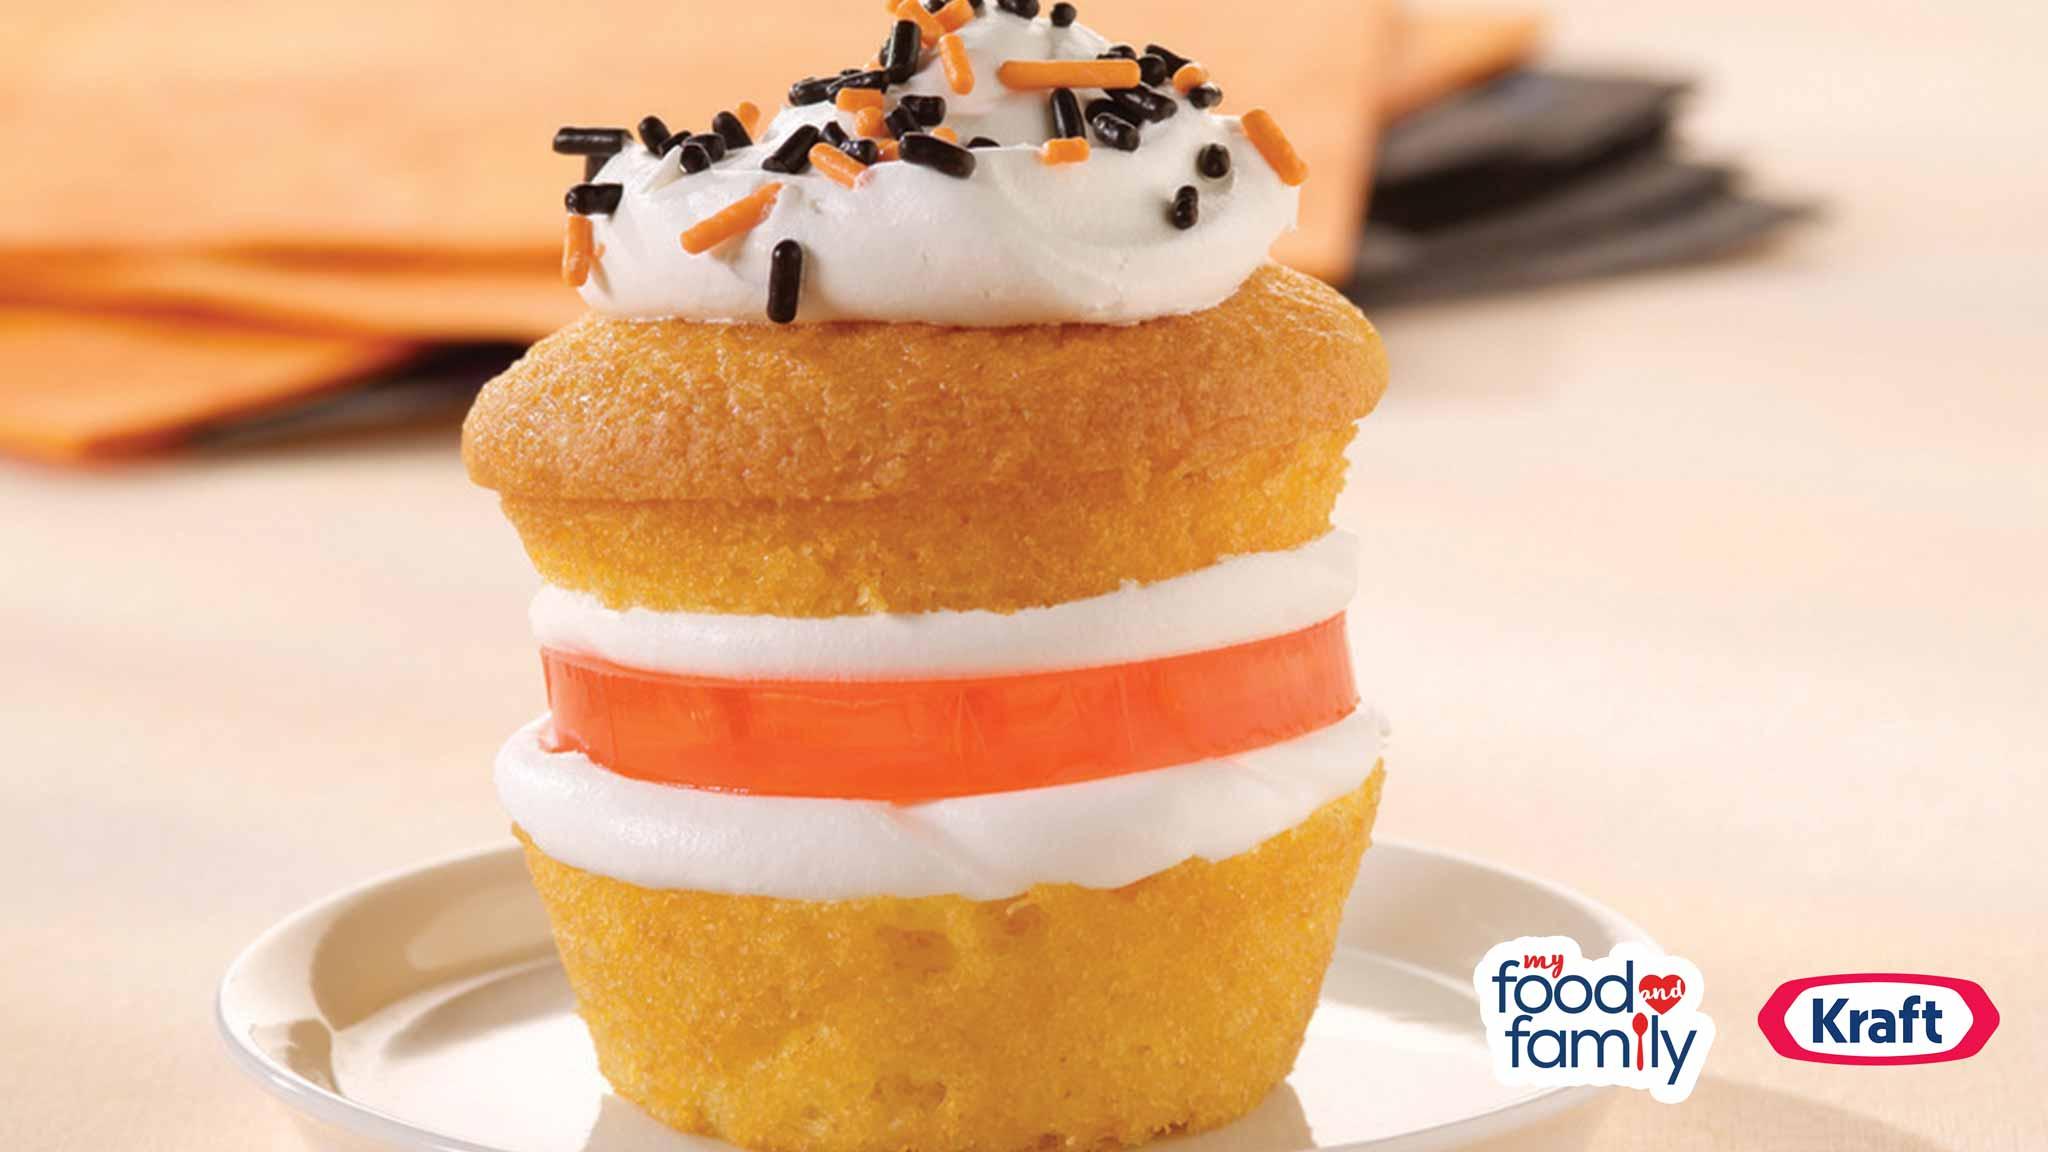 Image for Recipe Wigglin' Jigglin' Cupcakes